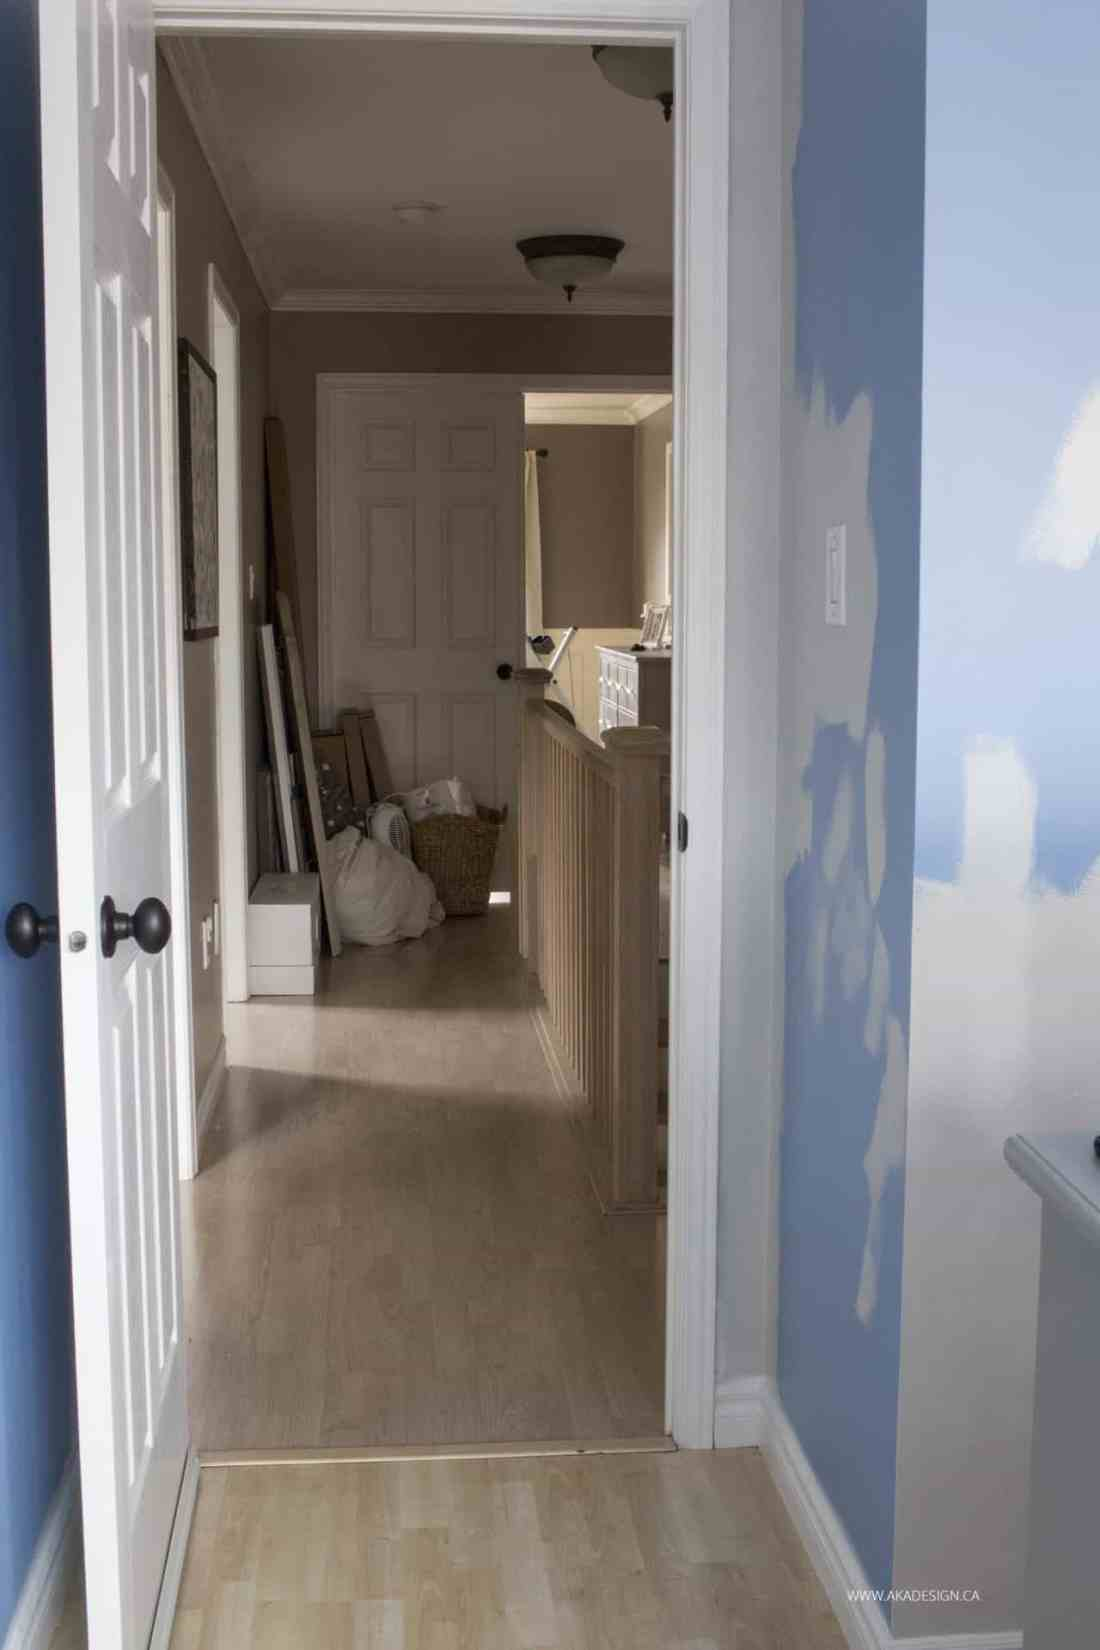 lilly's room progress 4